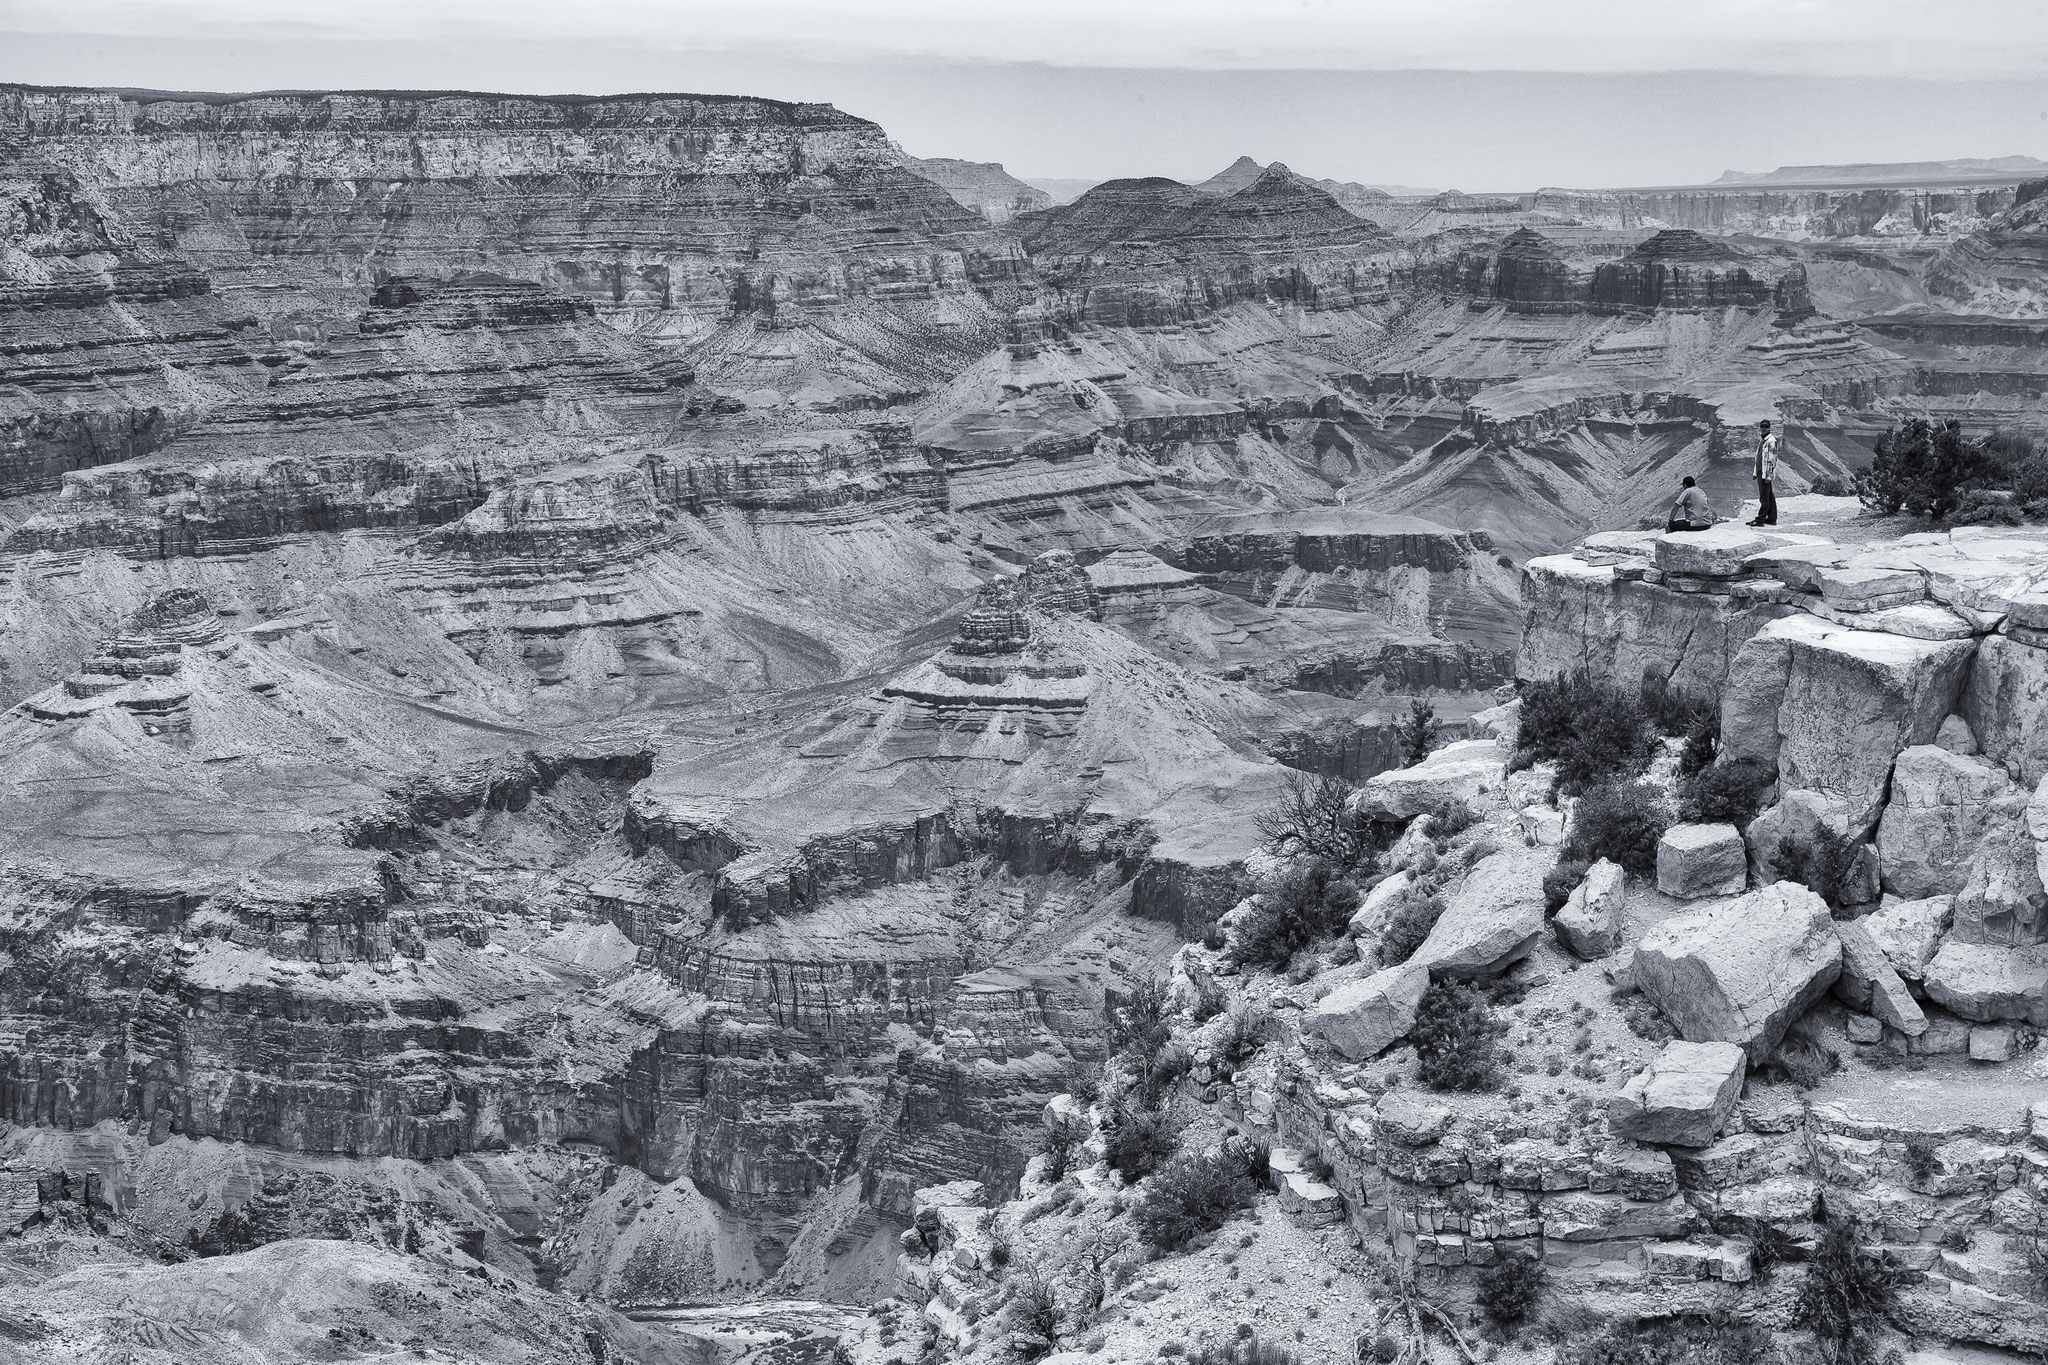 © Hans G. Lehmann | Grand Canyon, Arizona, USA